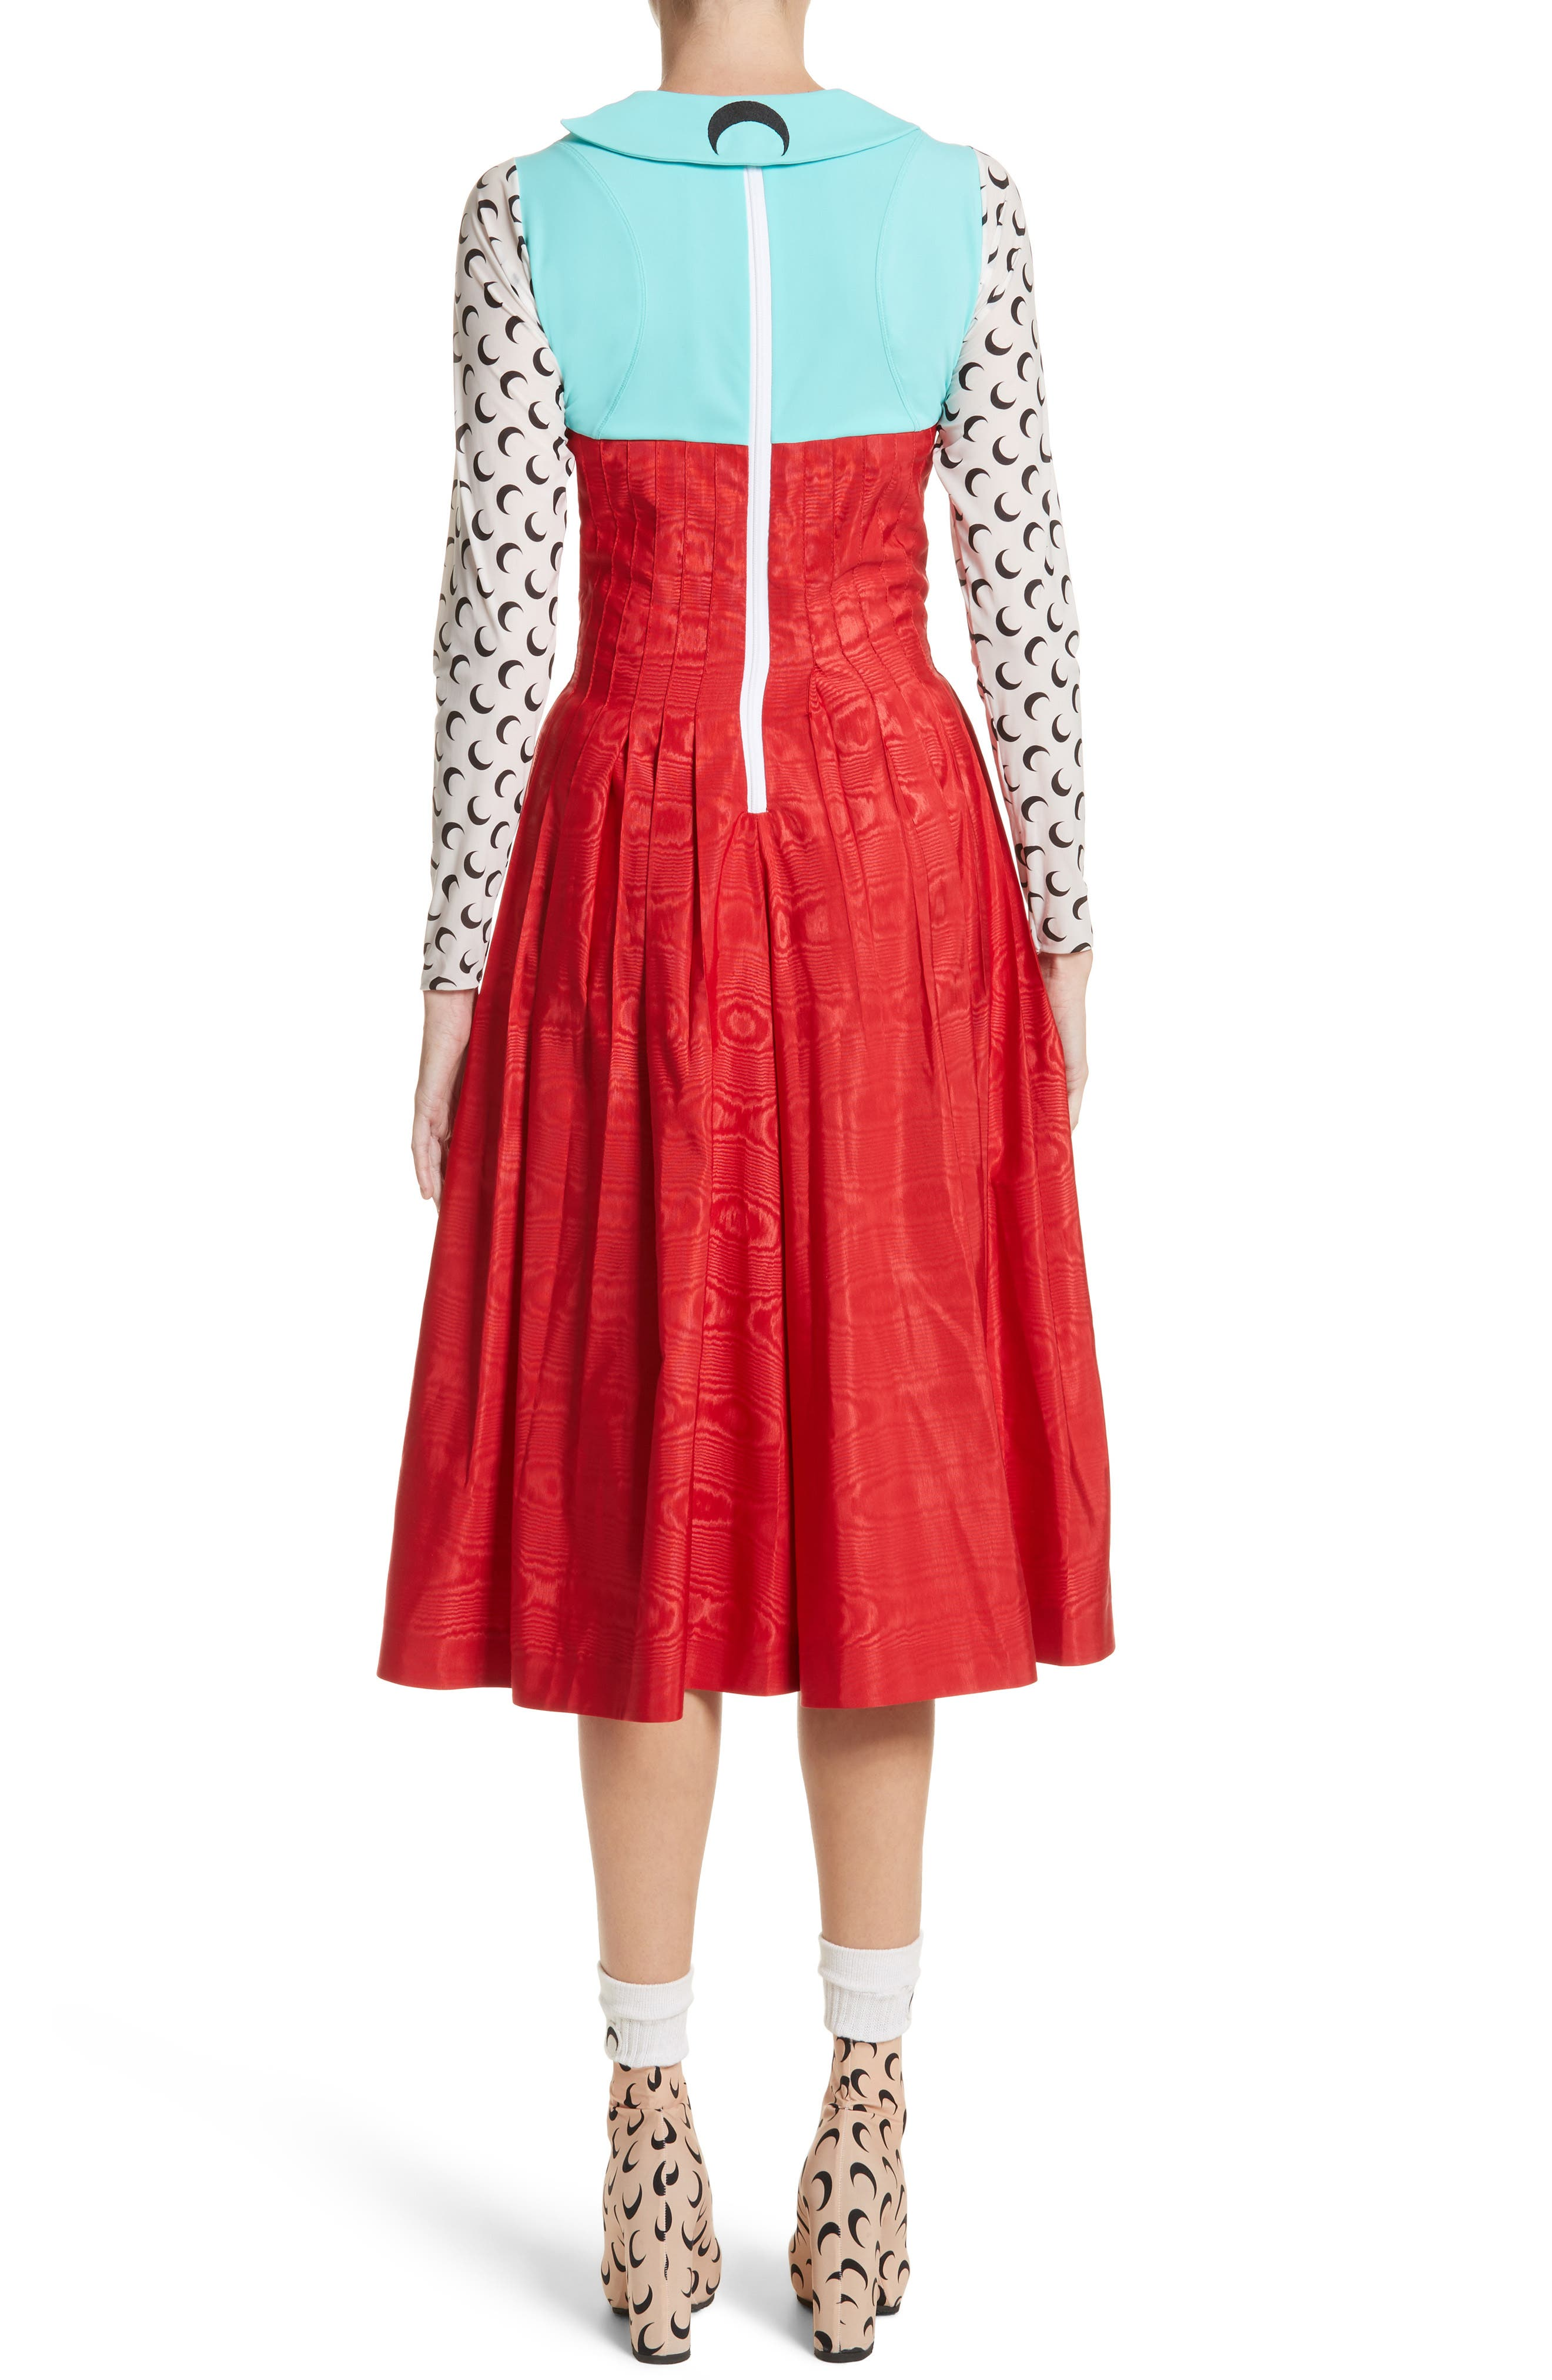 Hybrid Moiré Dress,                             Alternate thumbnail 2, color,                             Turquoise/ Red